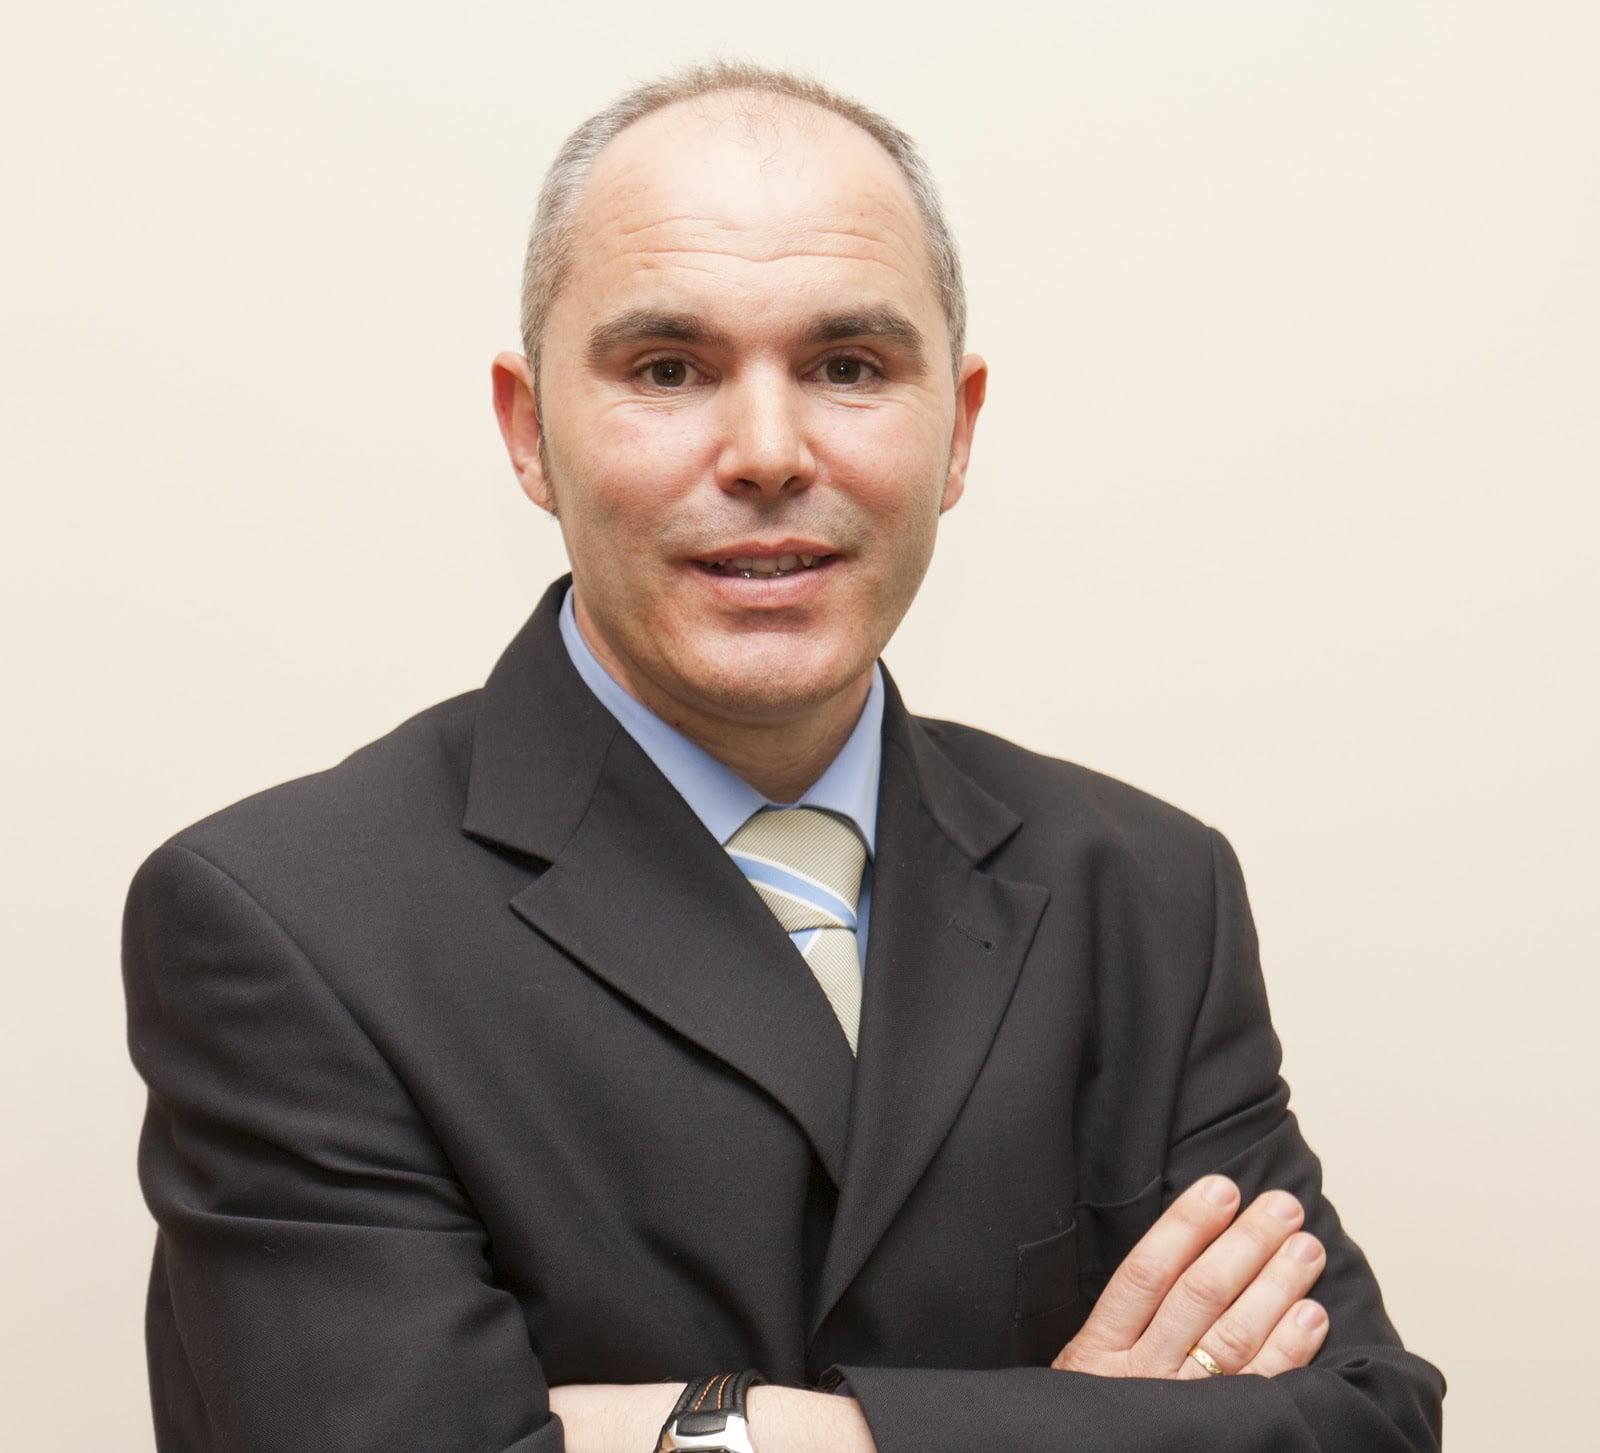 Francisco Casquero Martínez